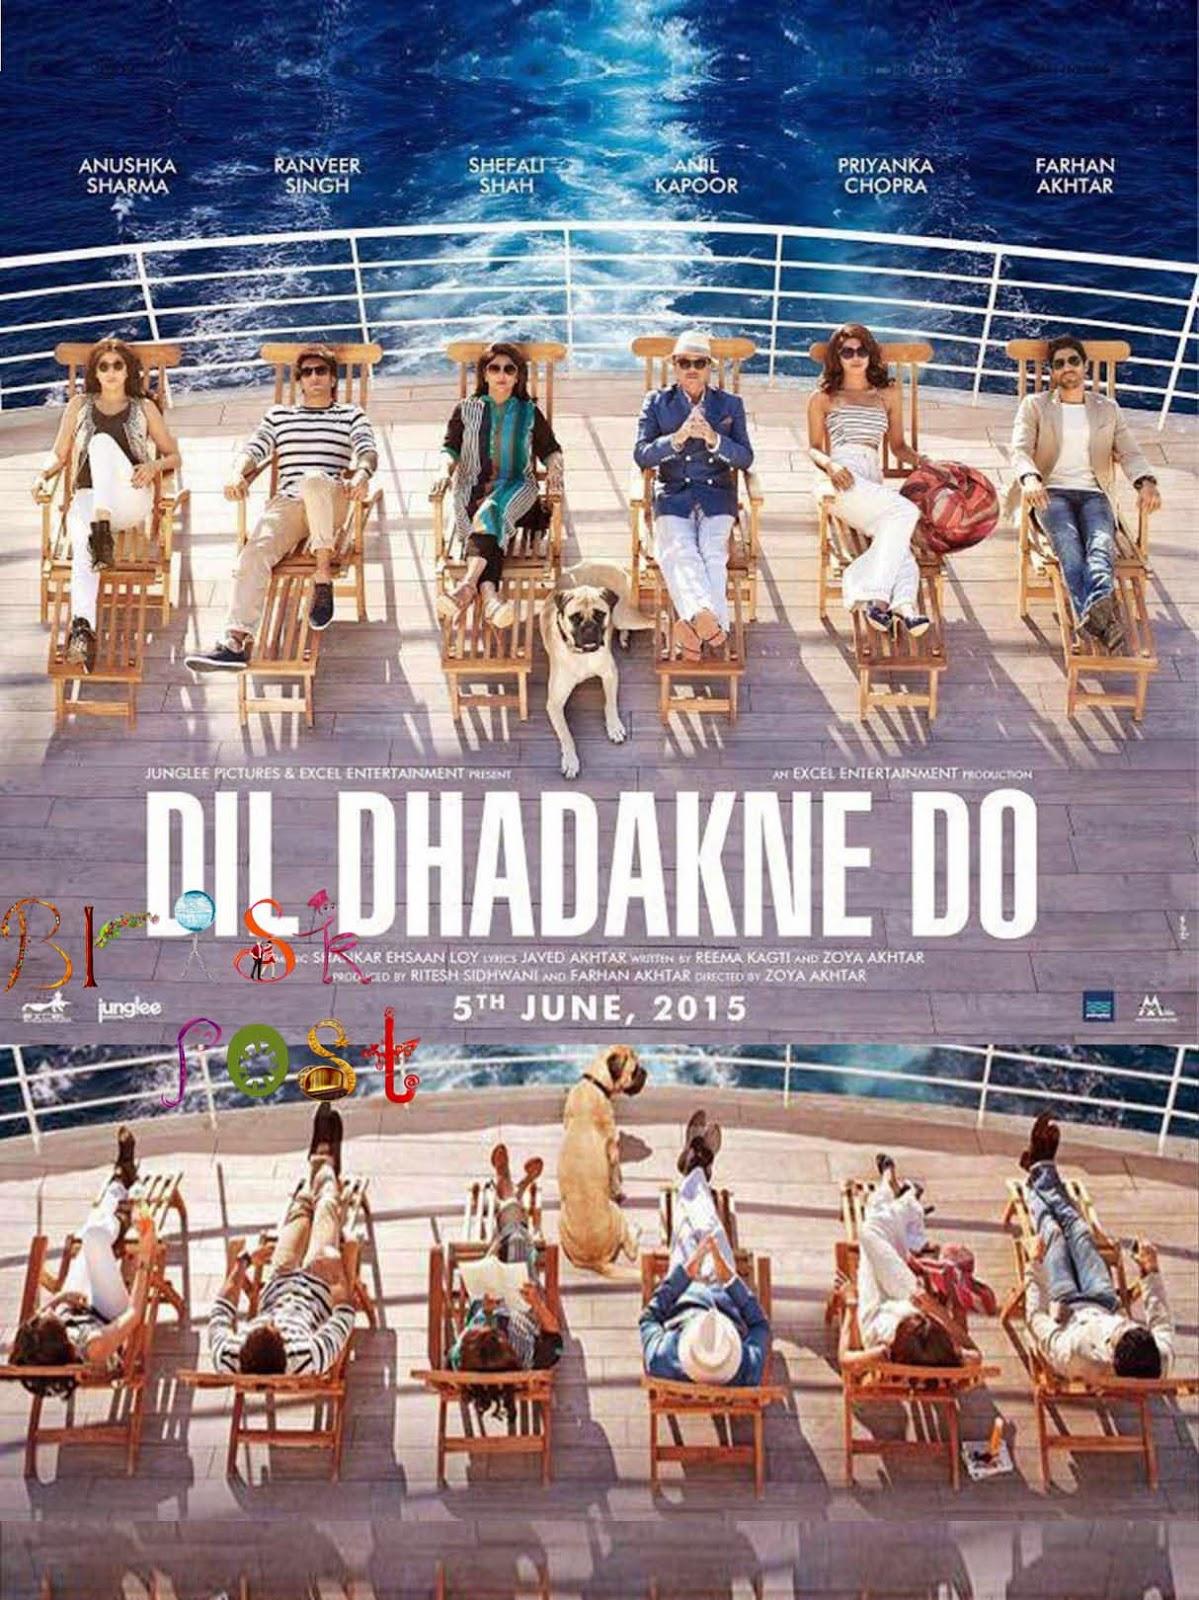 Dil Dhadakne Do Poster featuring Ranveer Singh, Priyanka Chopra, Anushka Sharma, Anil Kapoor, Farhan AKhtar, and Shefali cruising in a ship